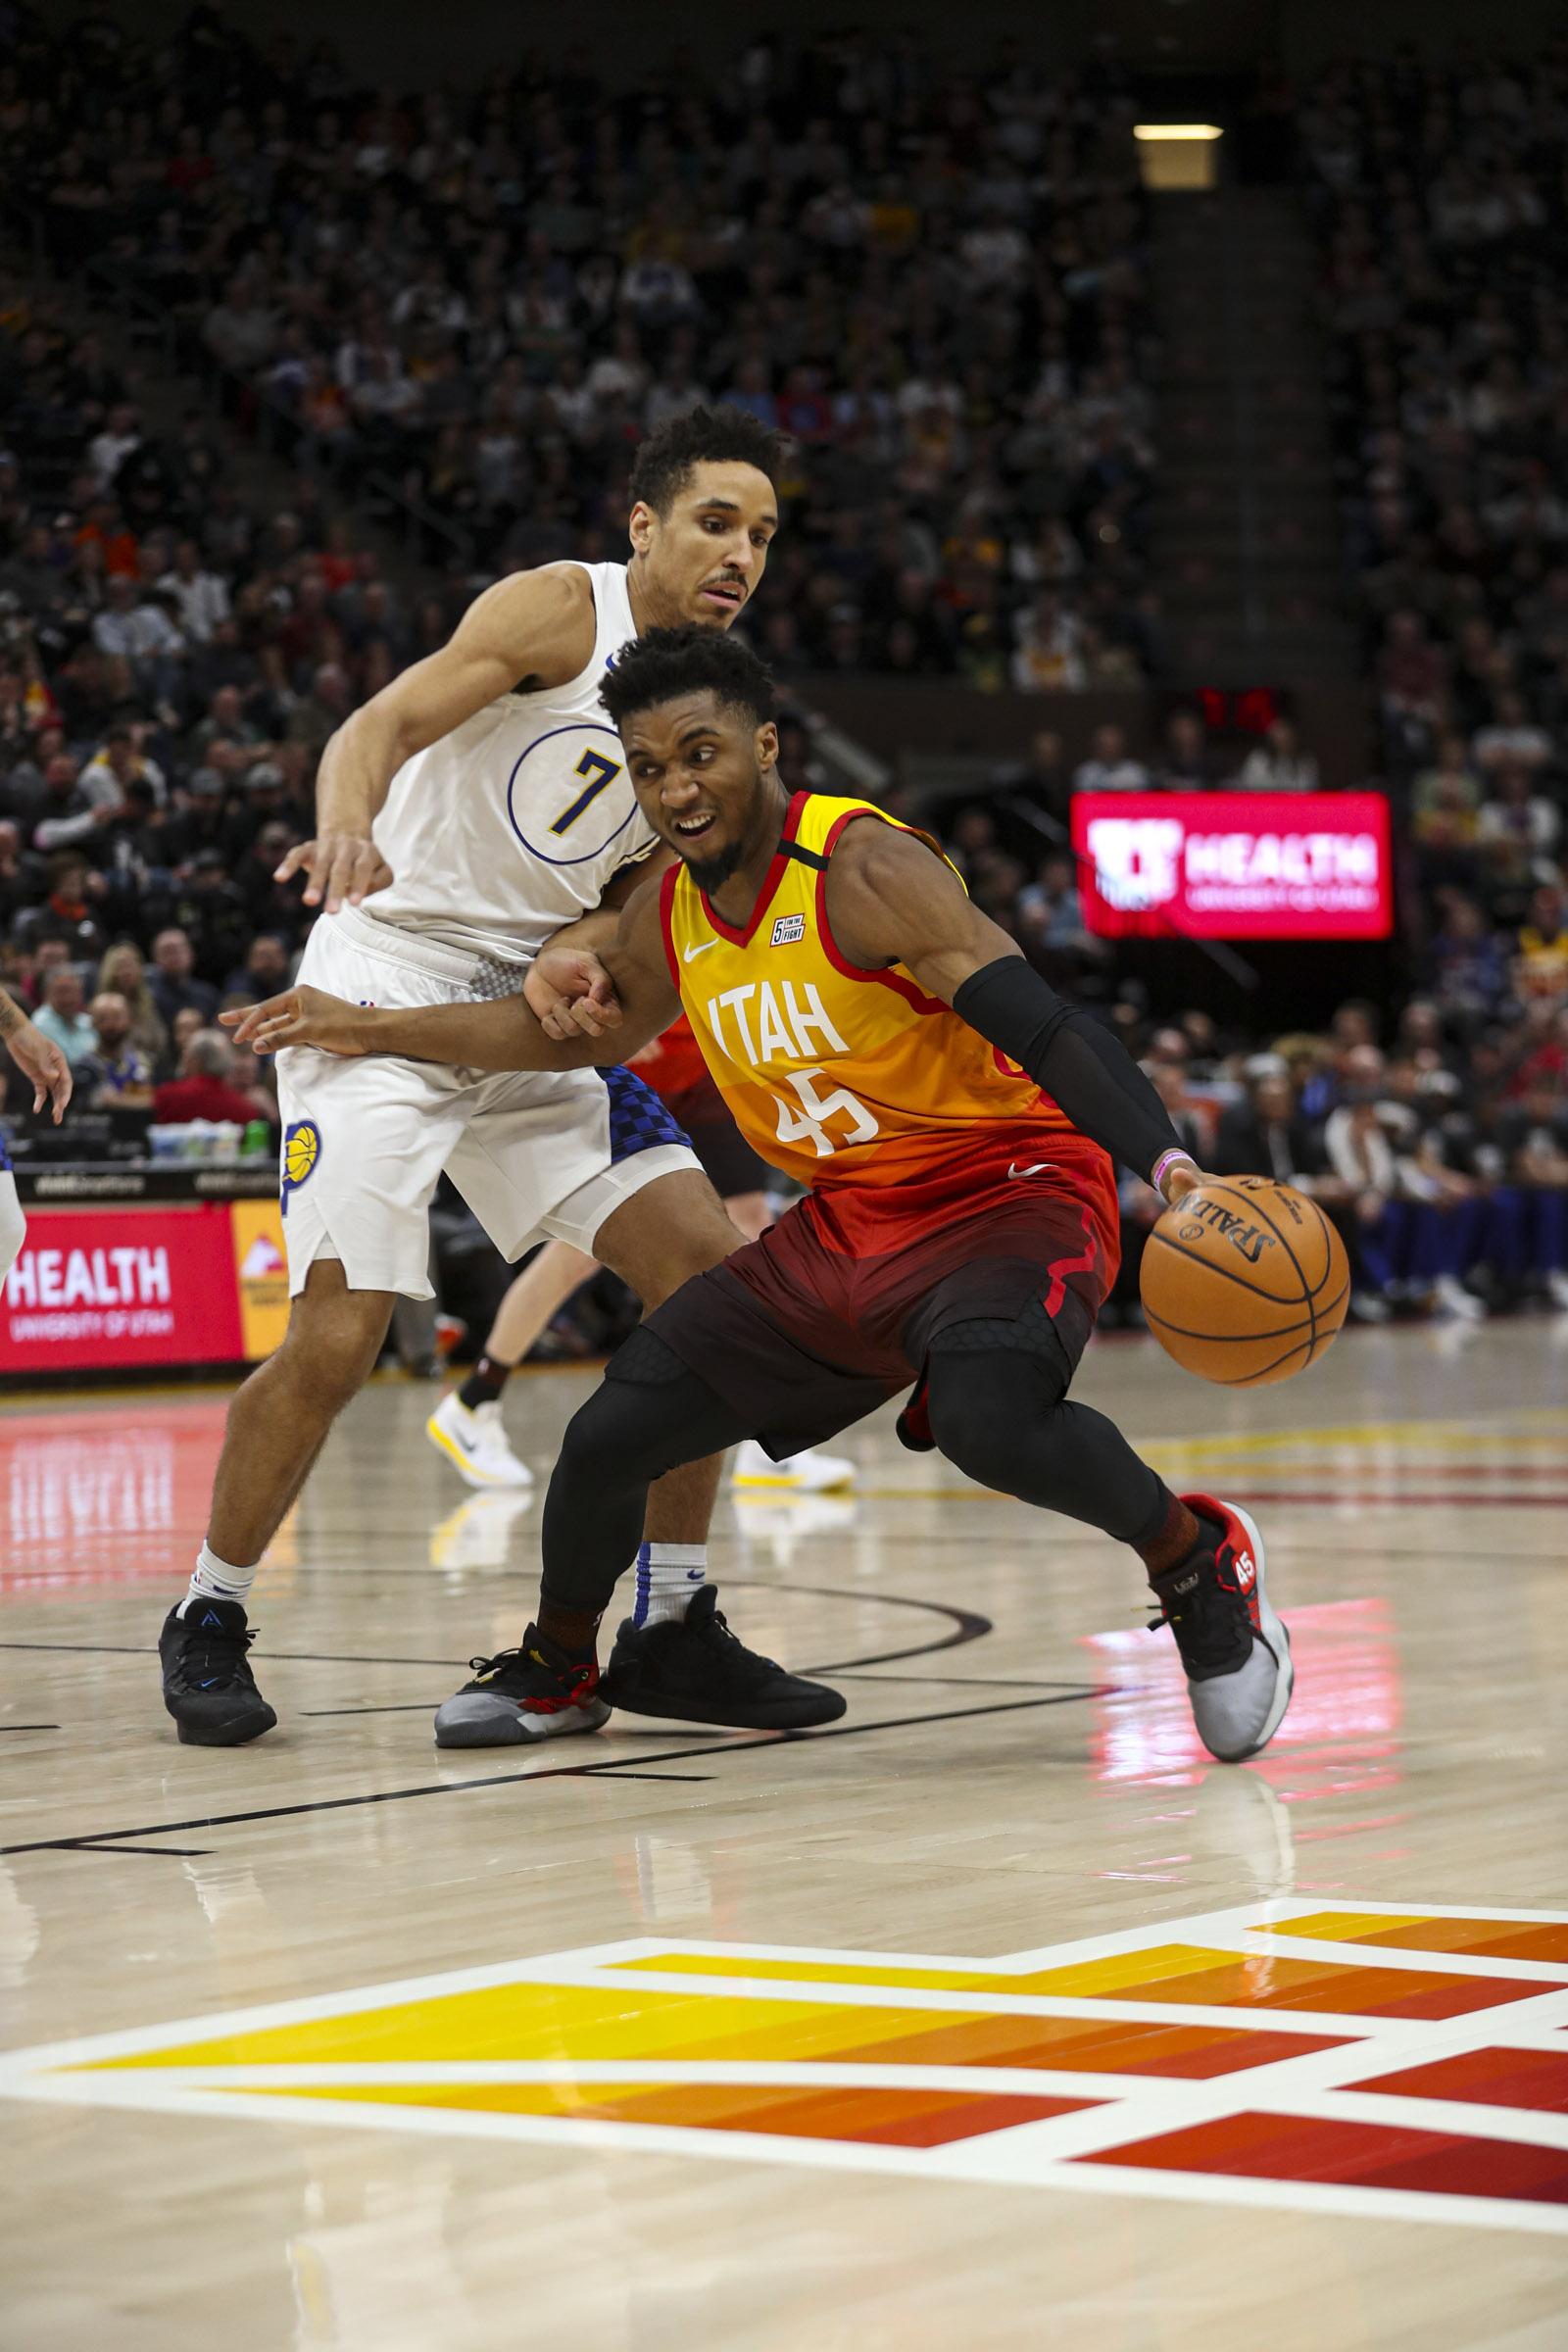 Utah Jazz guard Donovan Mitchell (45) moves around Indiana Pacers guard Malcom Brogdon (7) during an NBA game at Vivint Arena in Salt Lake City on Monday, Jan. 20, 2020.